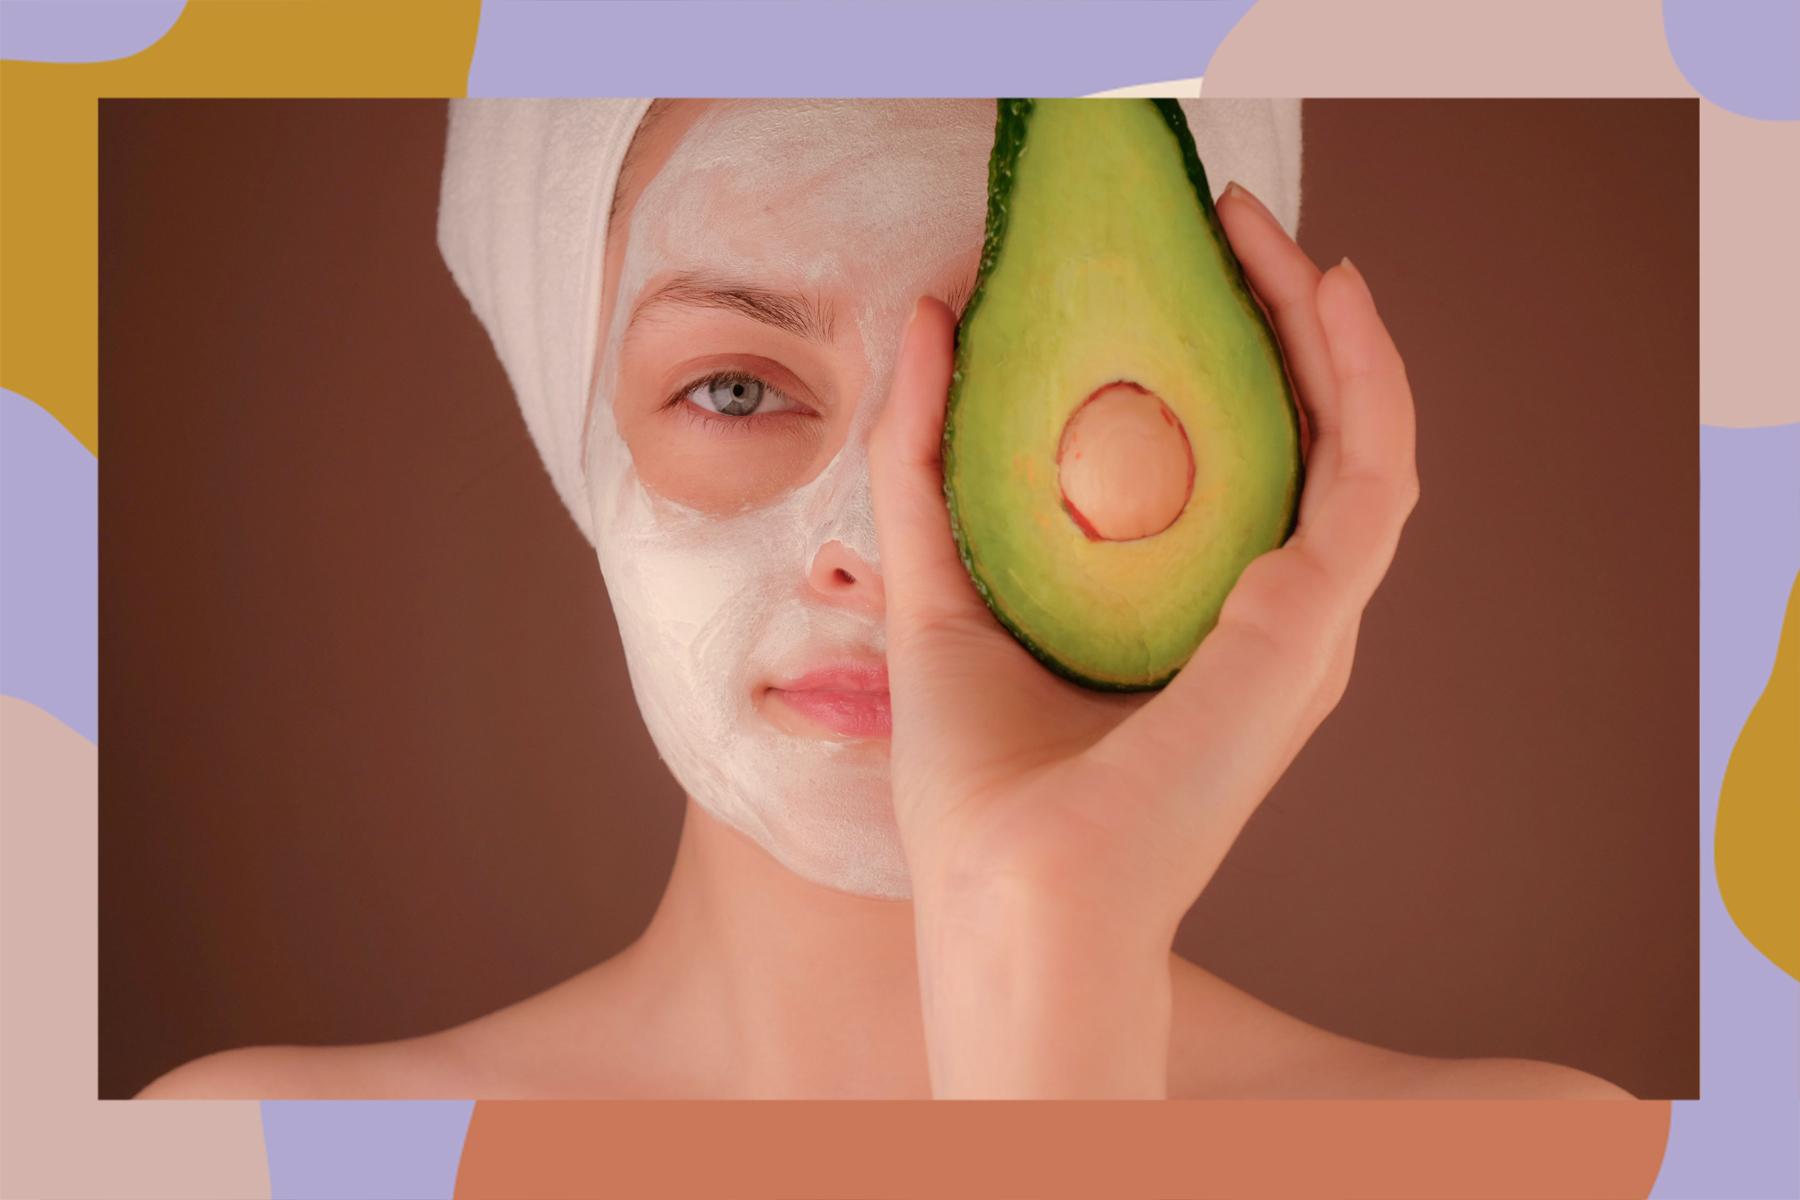 diy beauty treatments tiktok hair skin